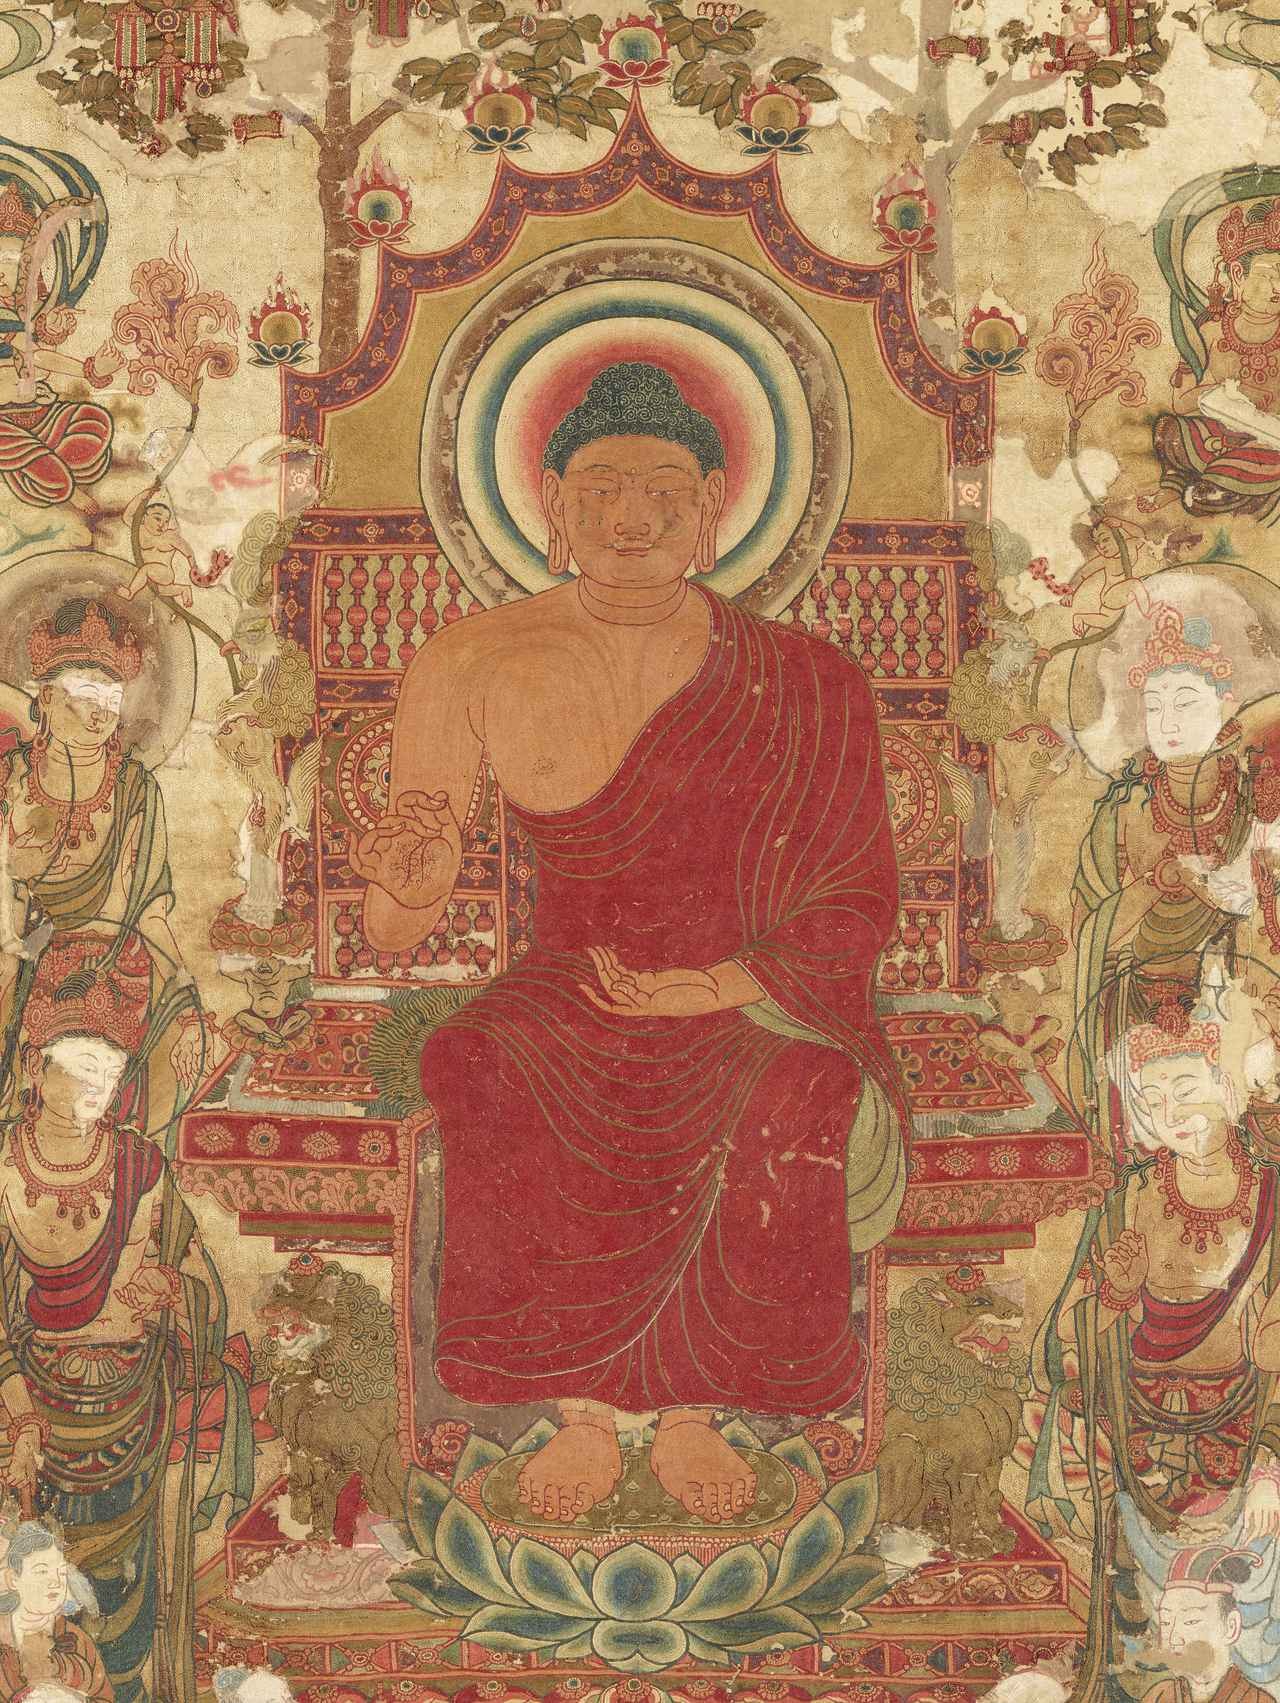 画像: 国宝 刺繡釈迦如来説法図(部分) 飛鳥時代または唐時代(8世紀) 前期